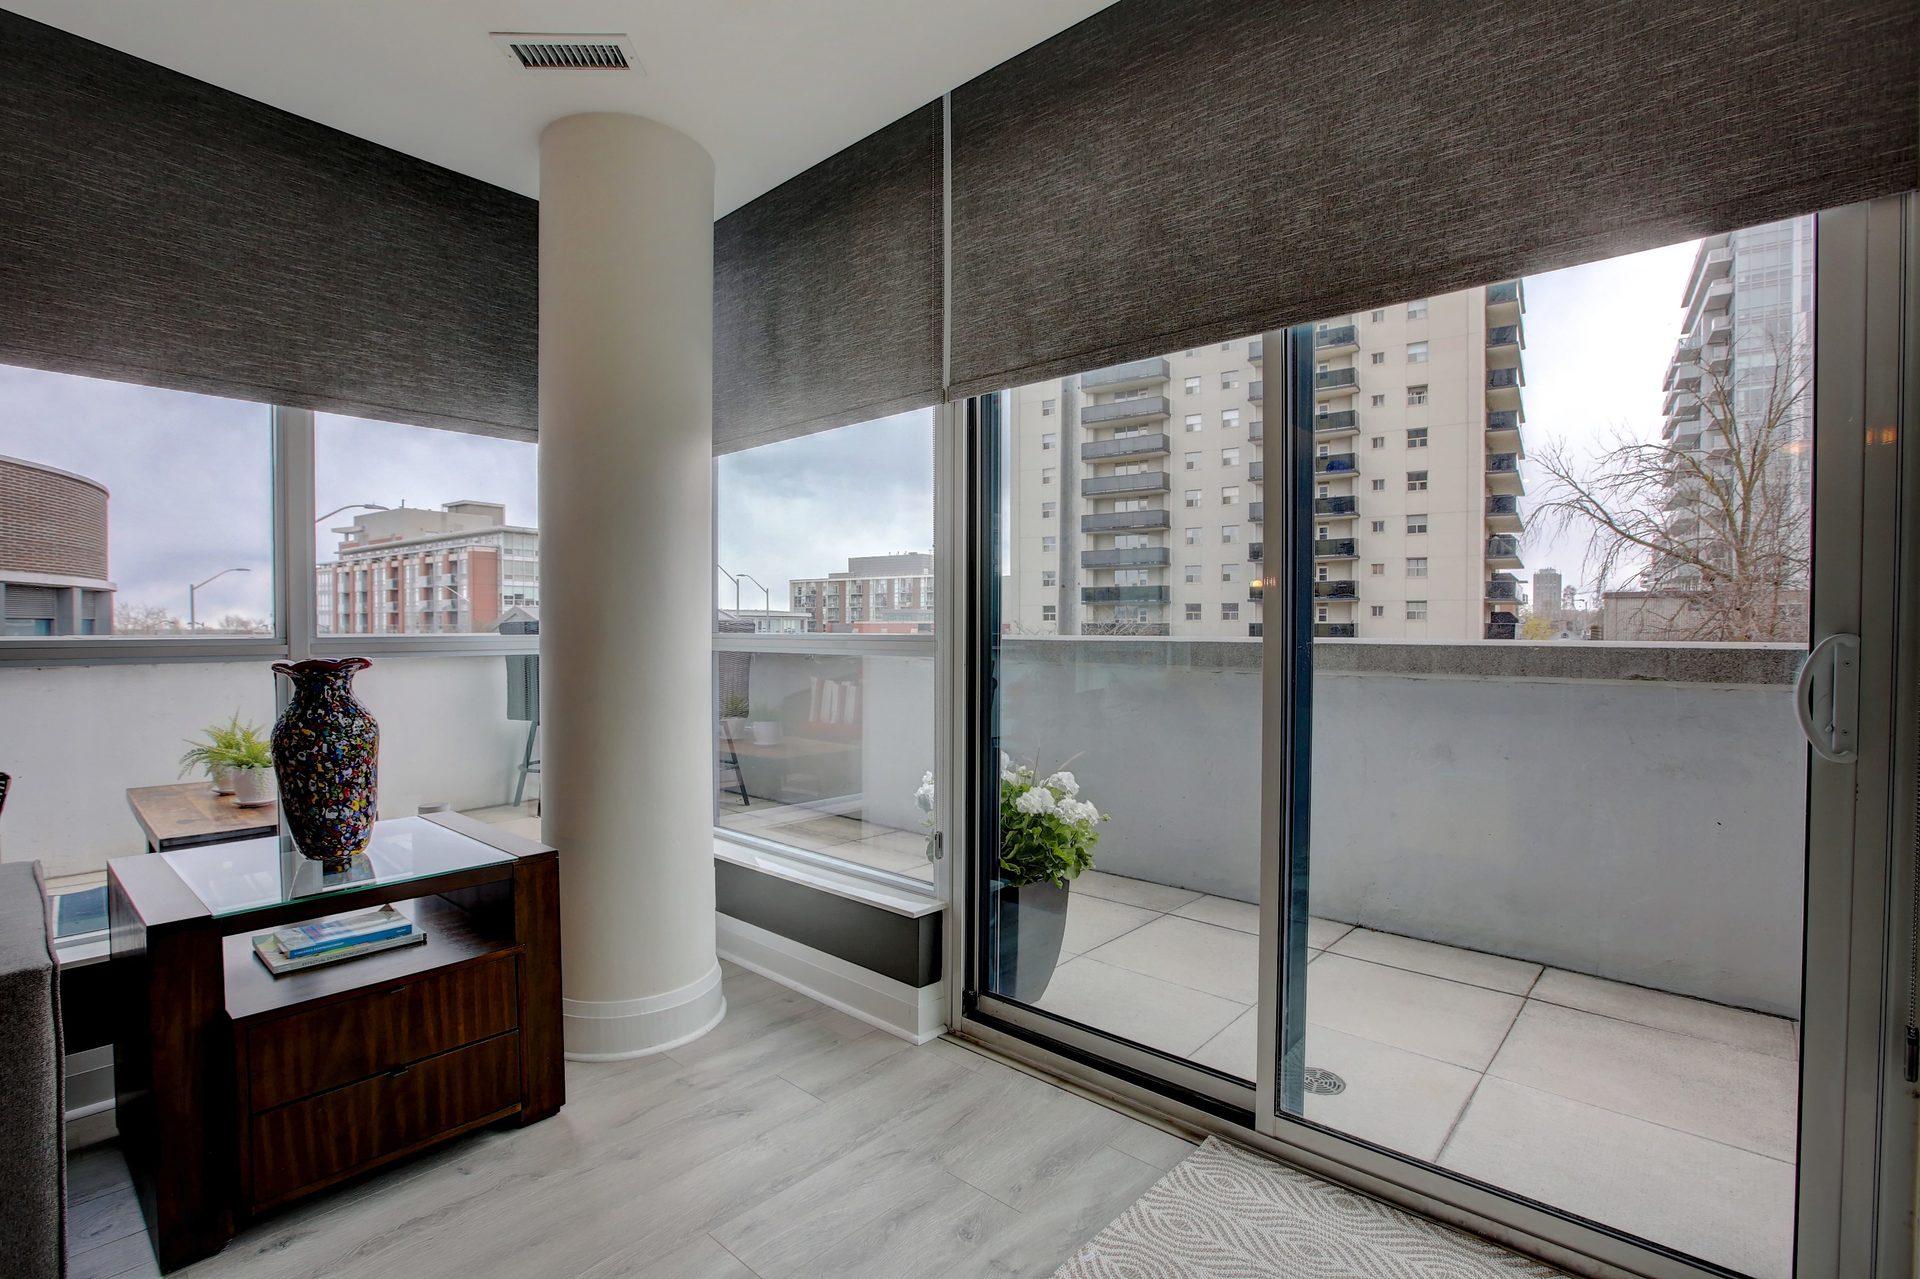 206-1 Hurontario St-Living Room/Terrace at 206 - 1 Hurontario Street, Port Credit, Mississauga